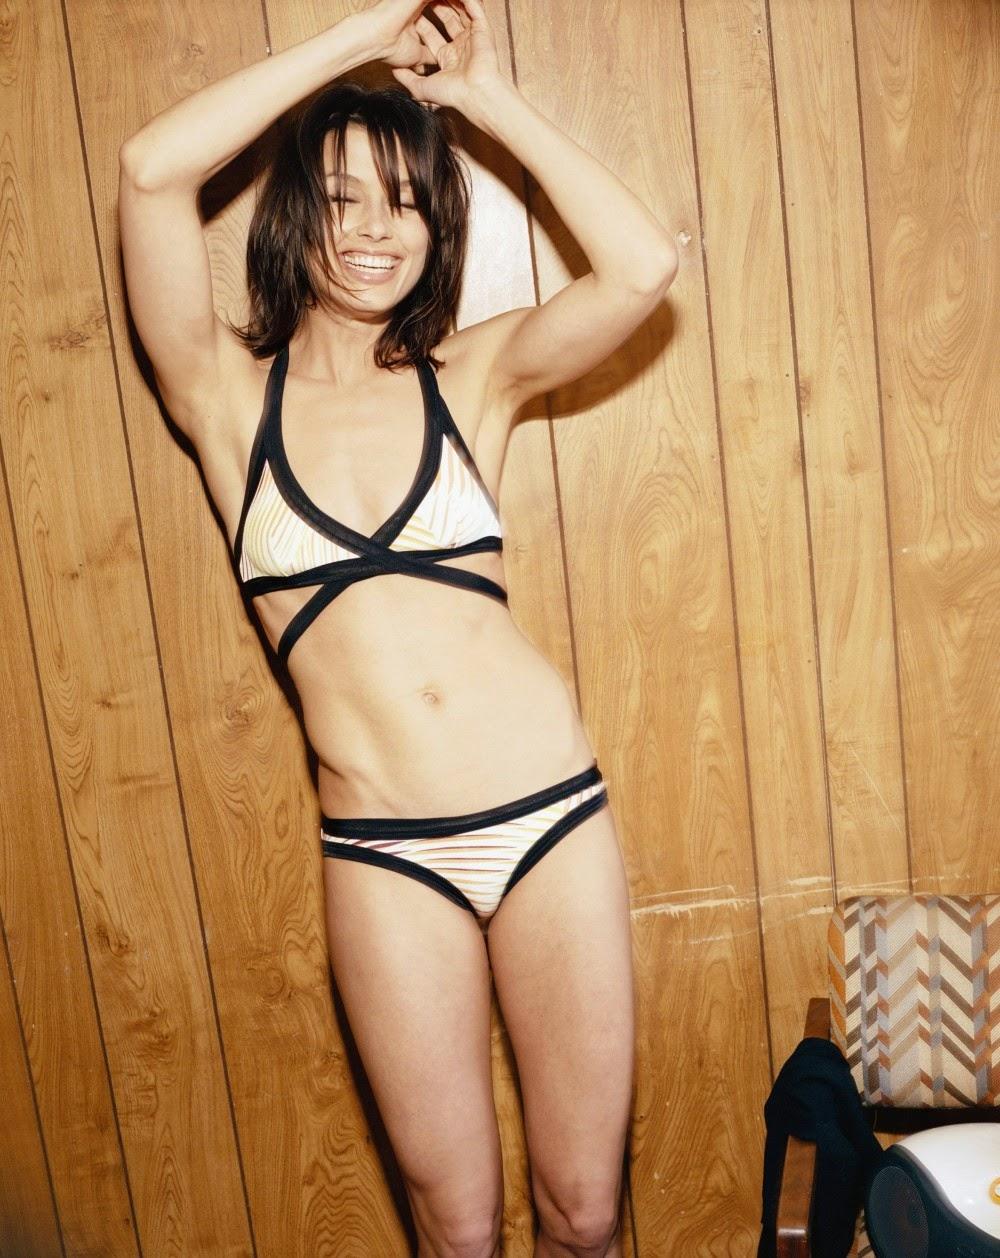 from Matthew bikini sex images model